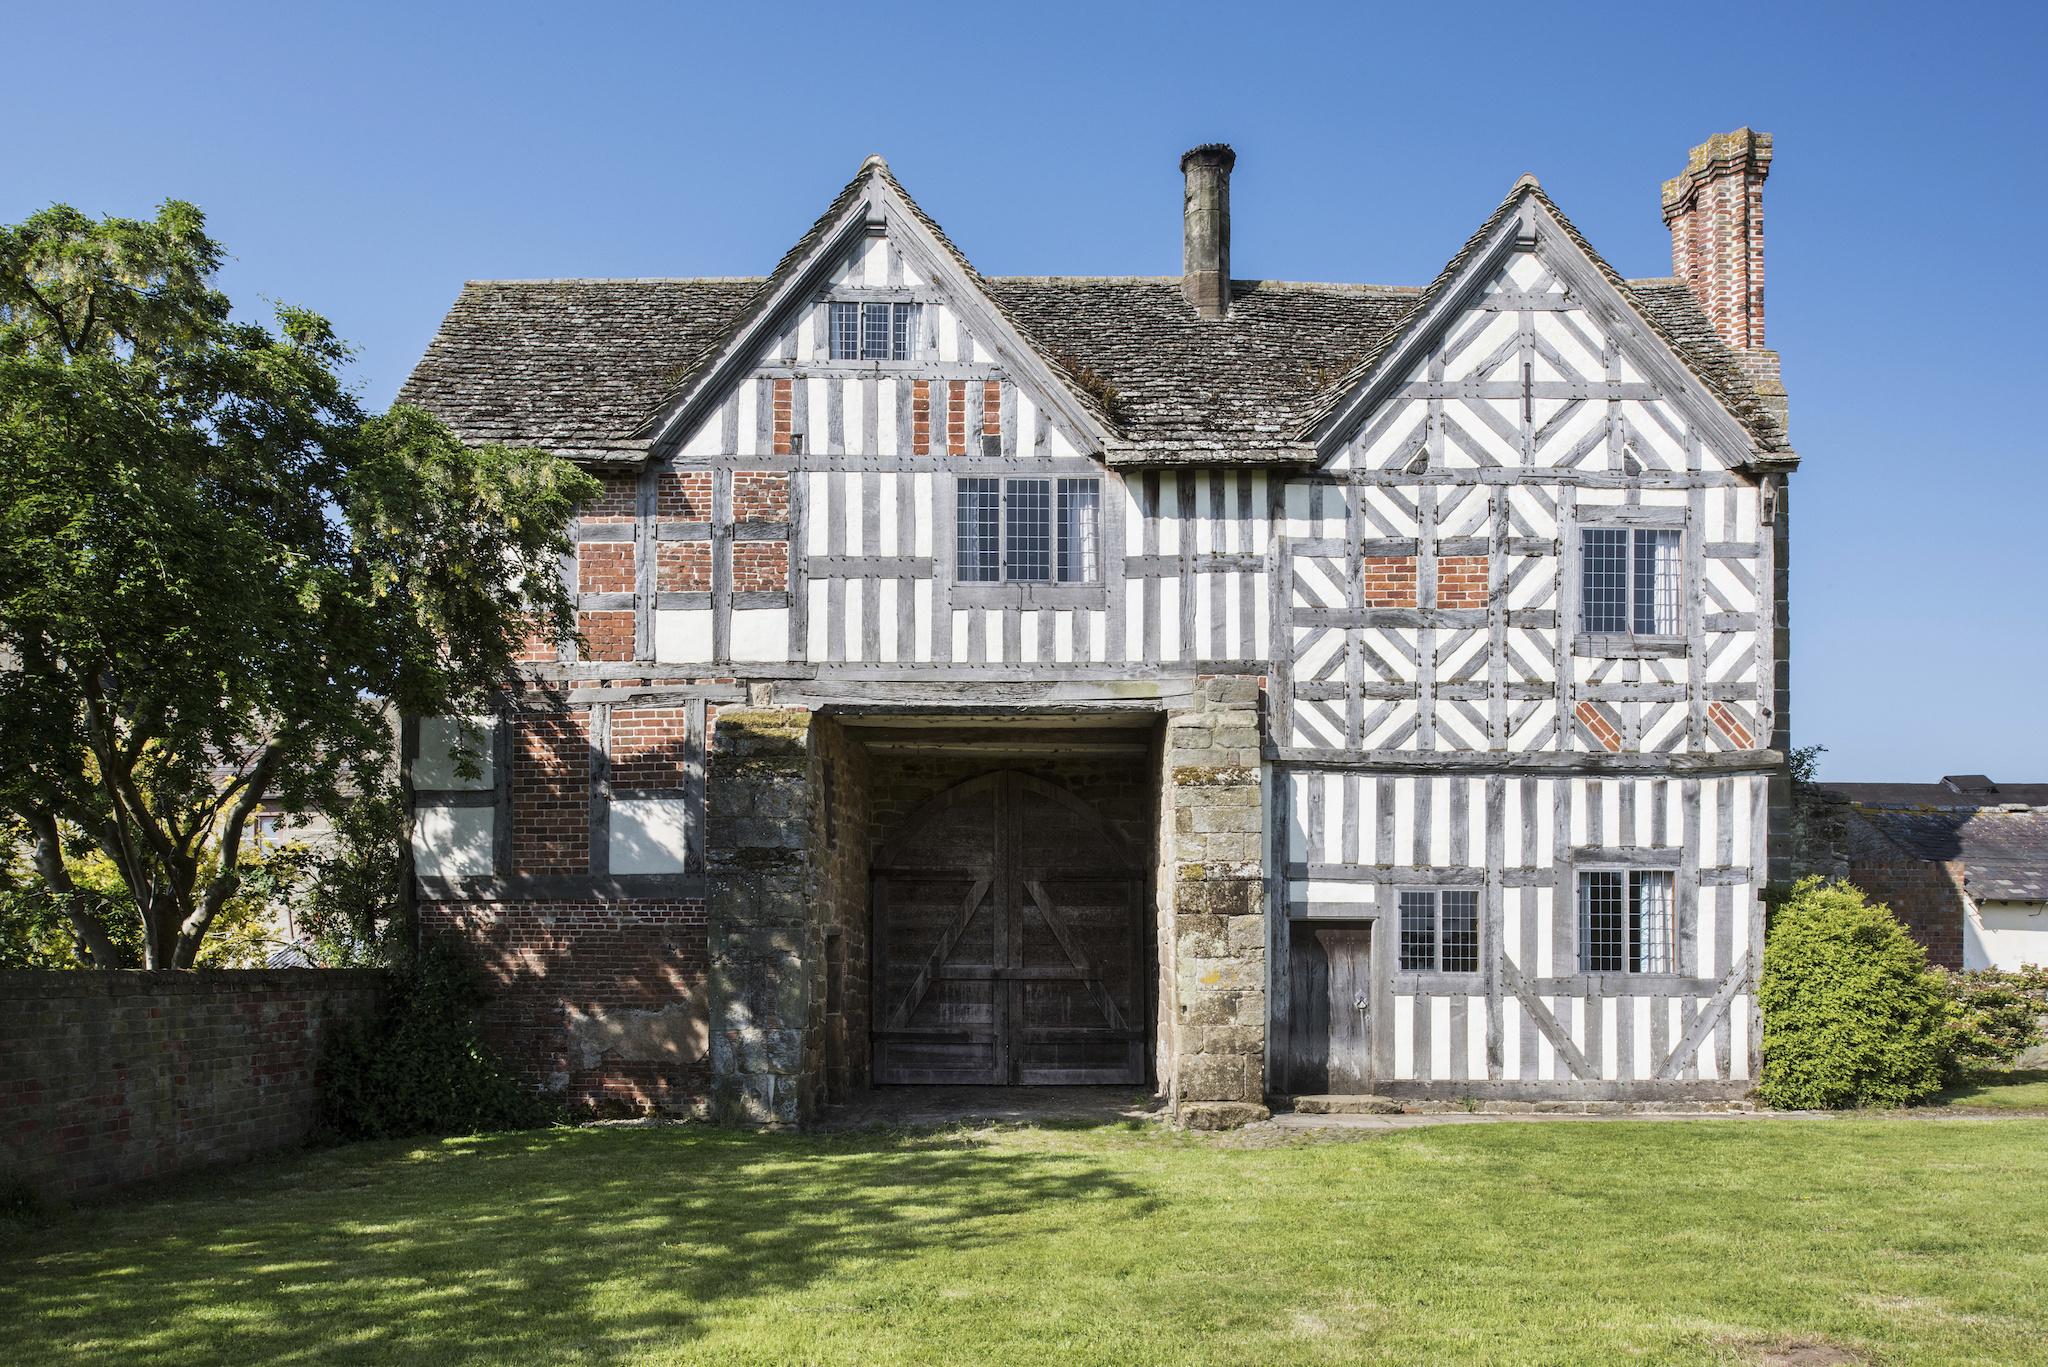 Langley Gatehouse, Shropshire